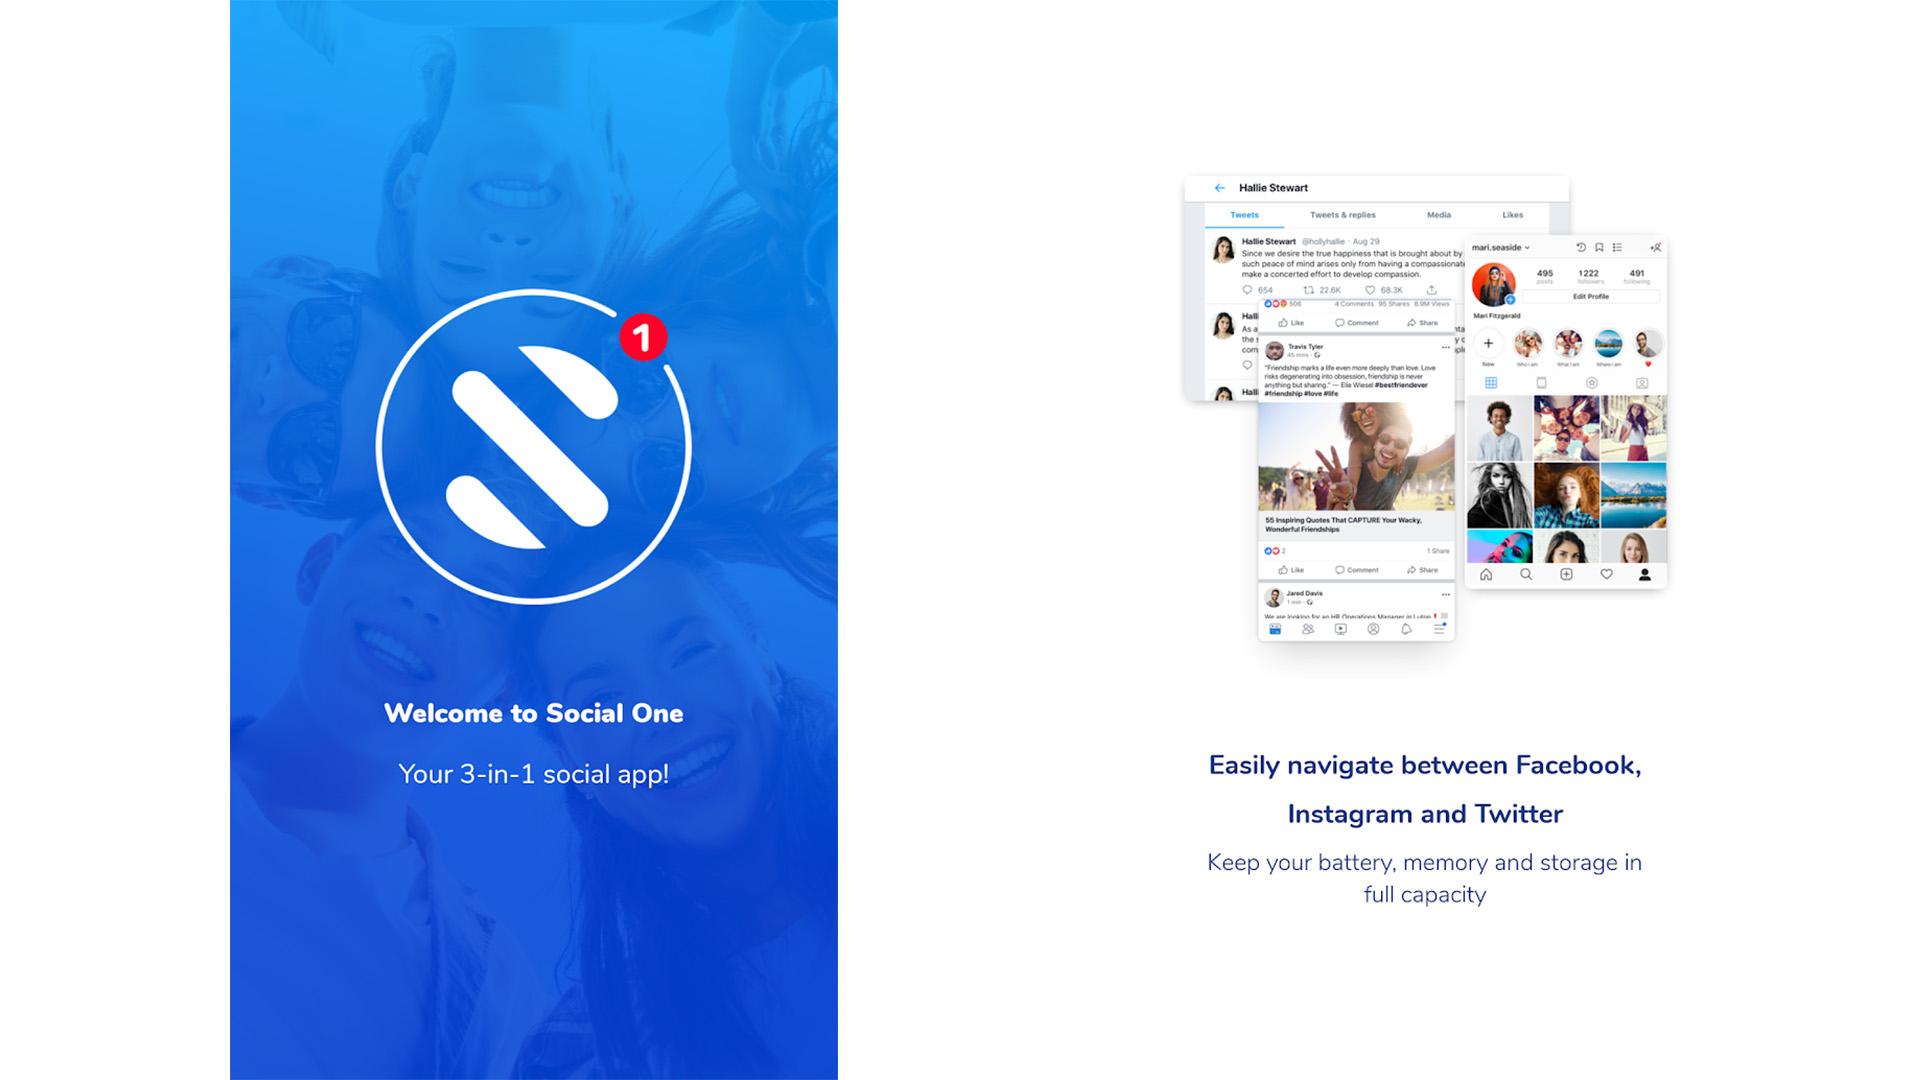 Social One screenshot 2021